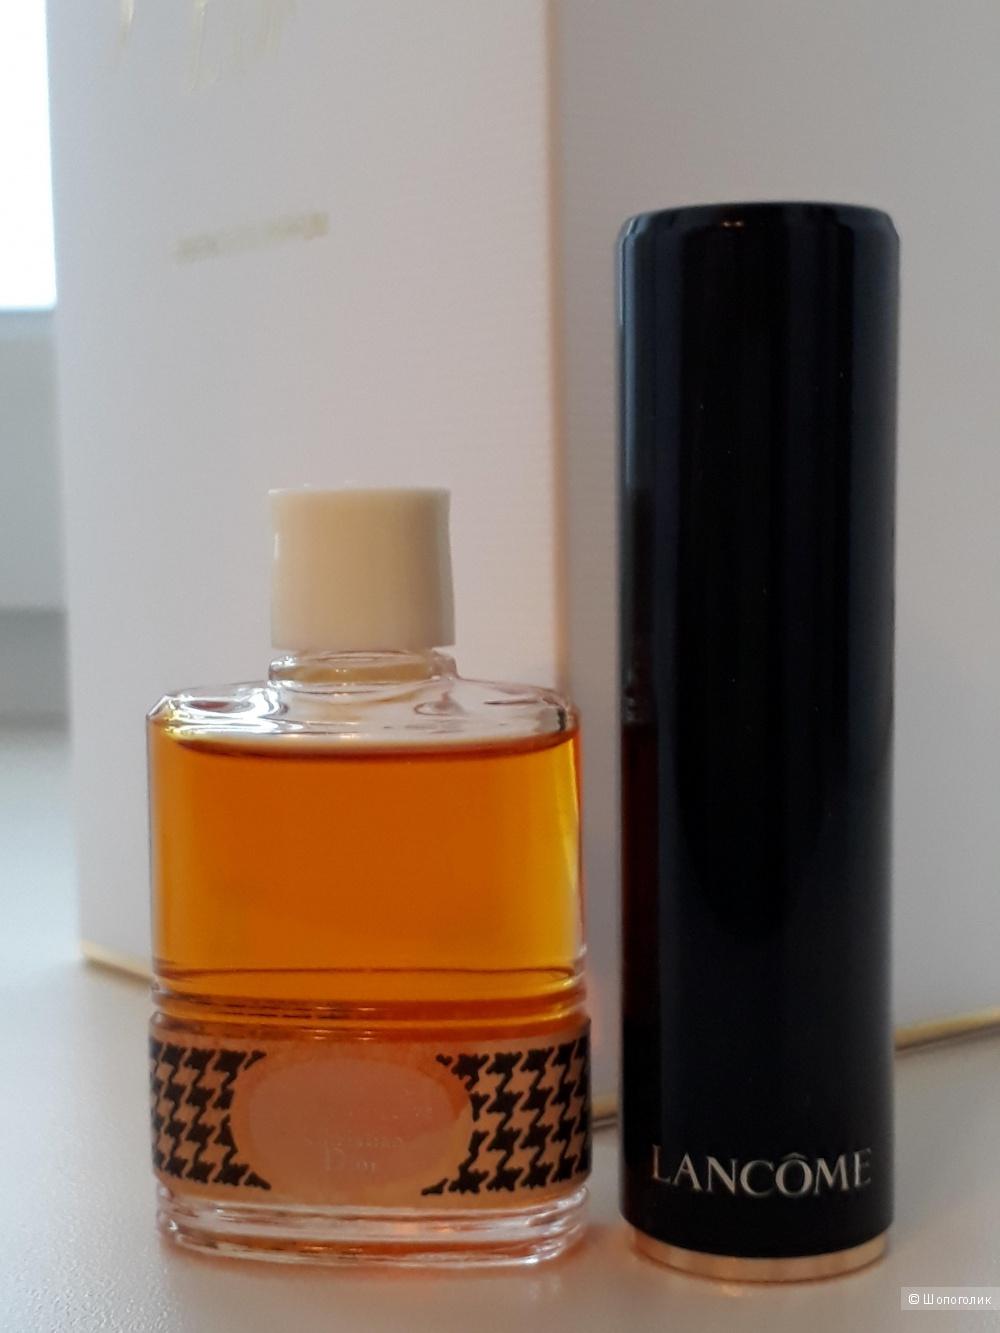 Миниатюра винтаж Diorissimo Christian Dior 10 ml туалетная вода